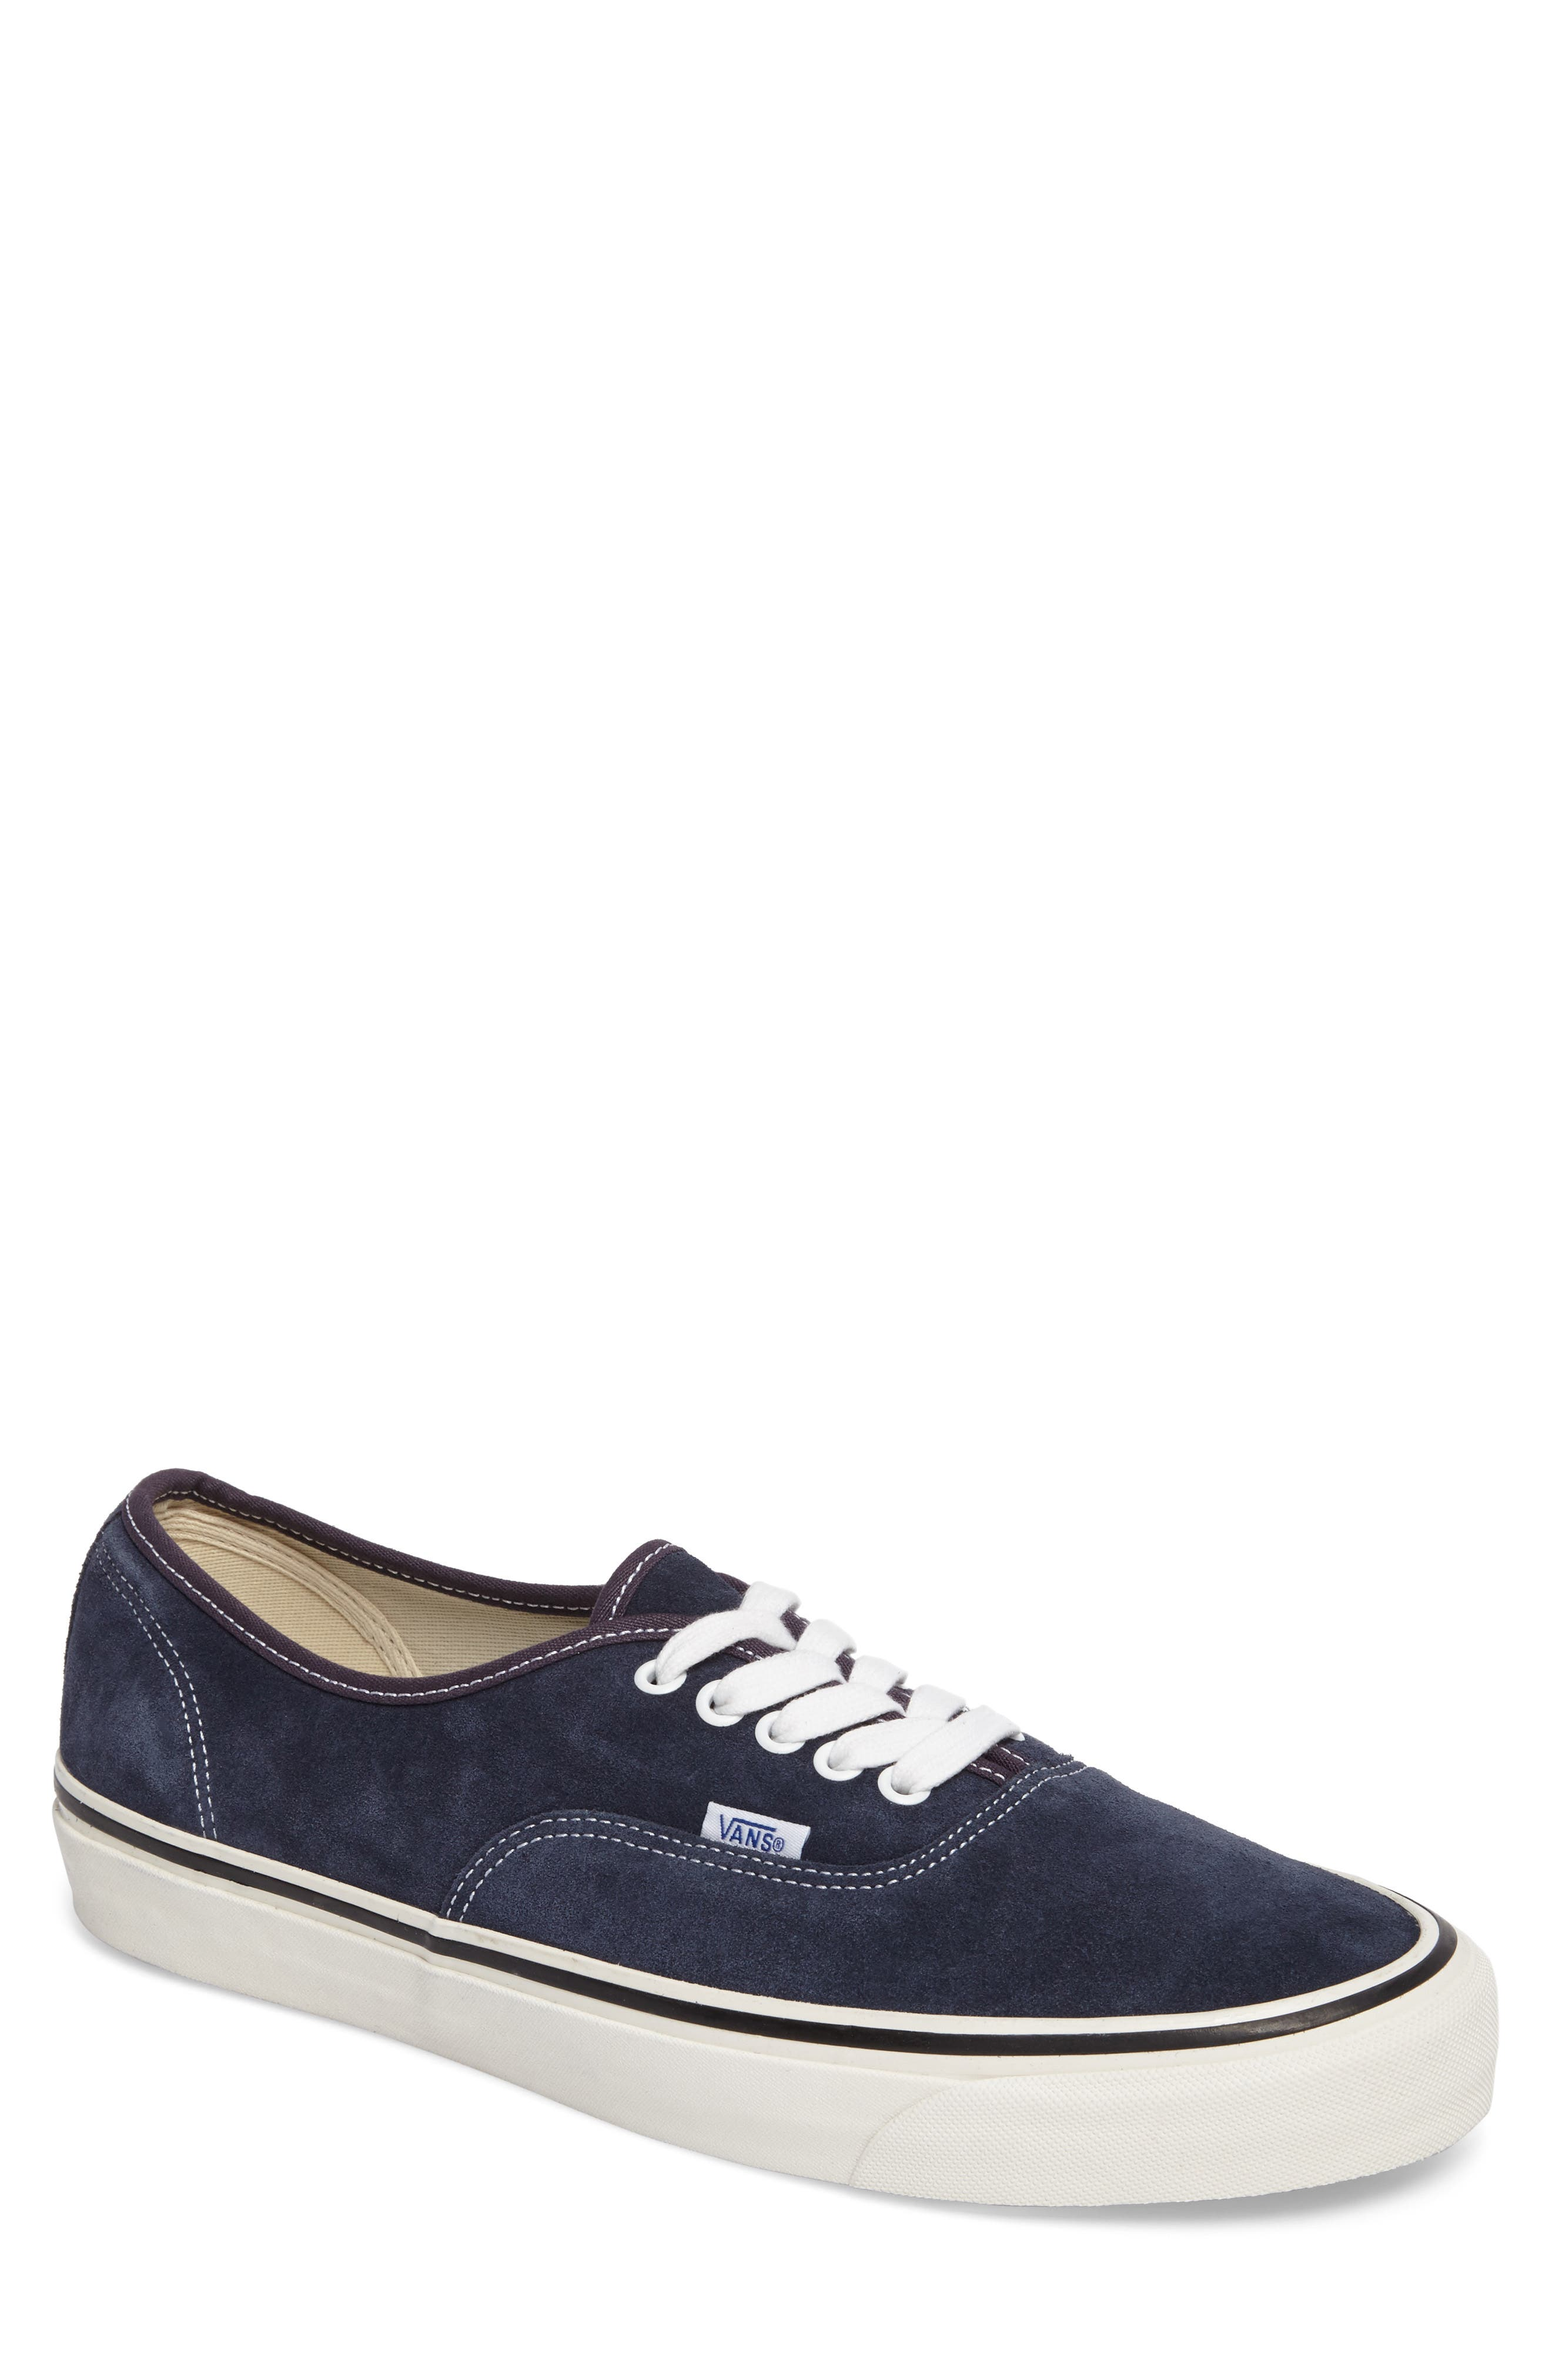 Alternate Image 1 Selected - Vans UA Authentic 44 DX Sneaker (Men)